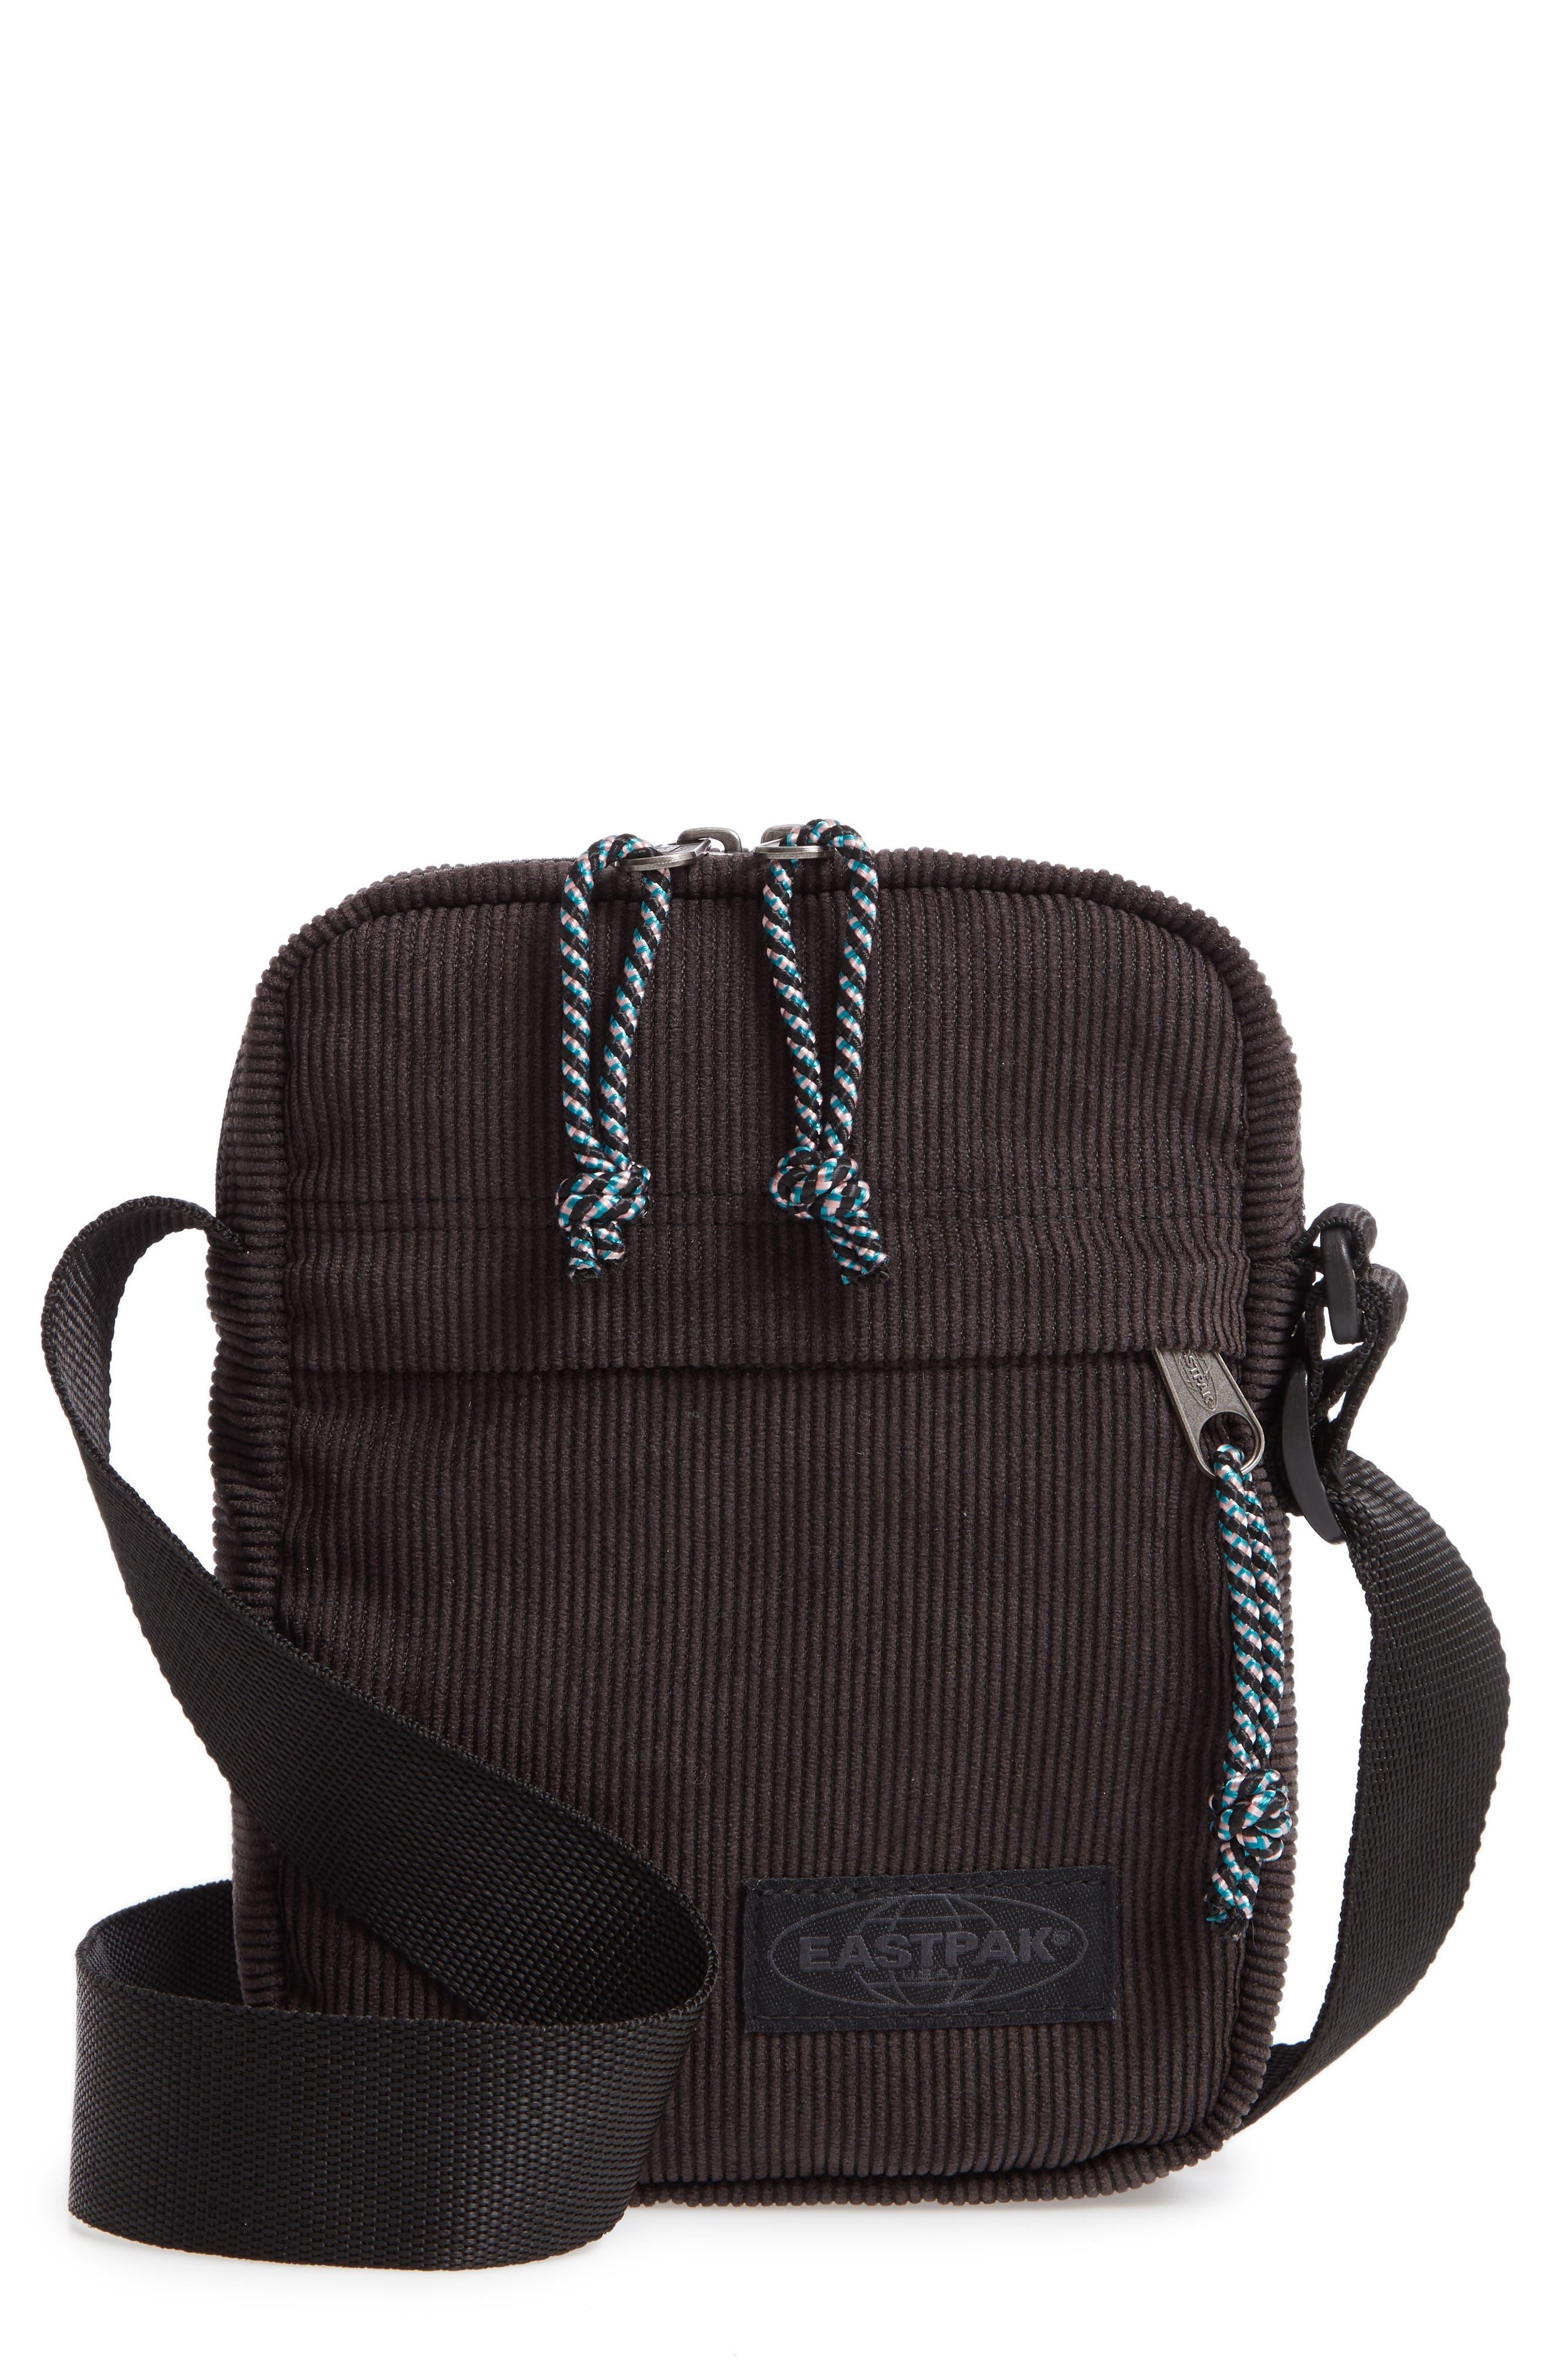 Eastpak The One Corduroy Crossbody Bag - Black